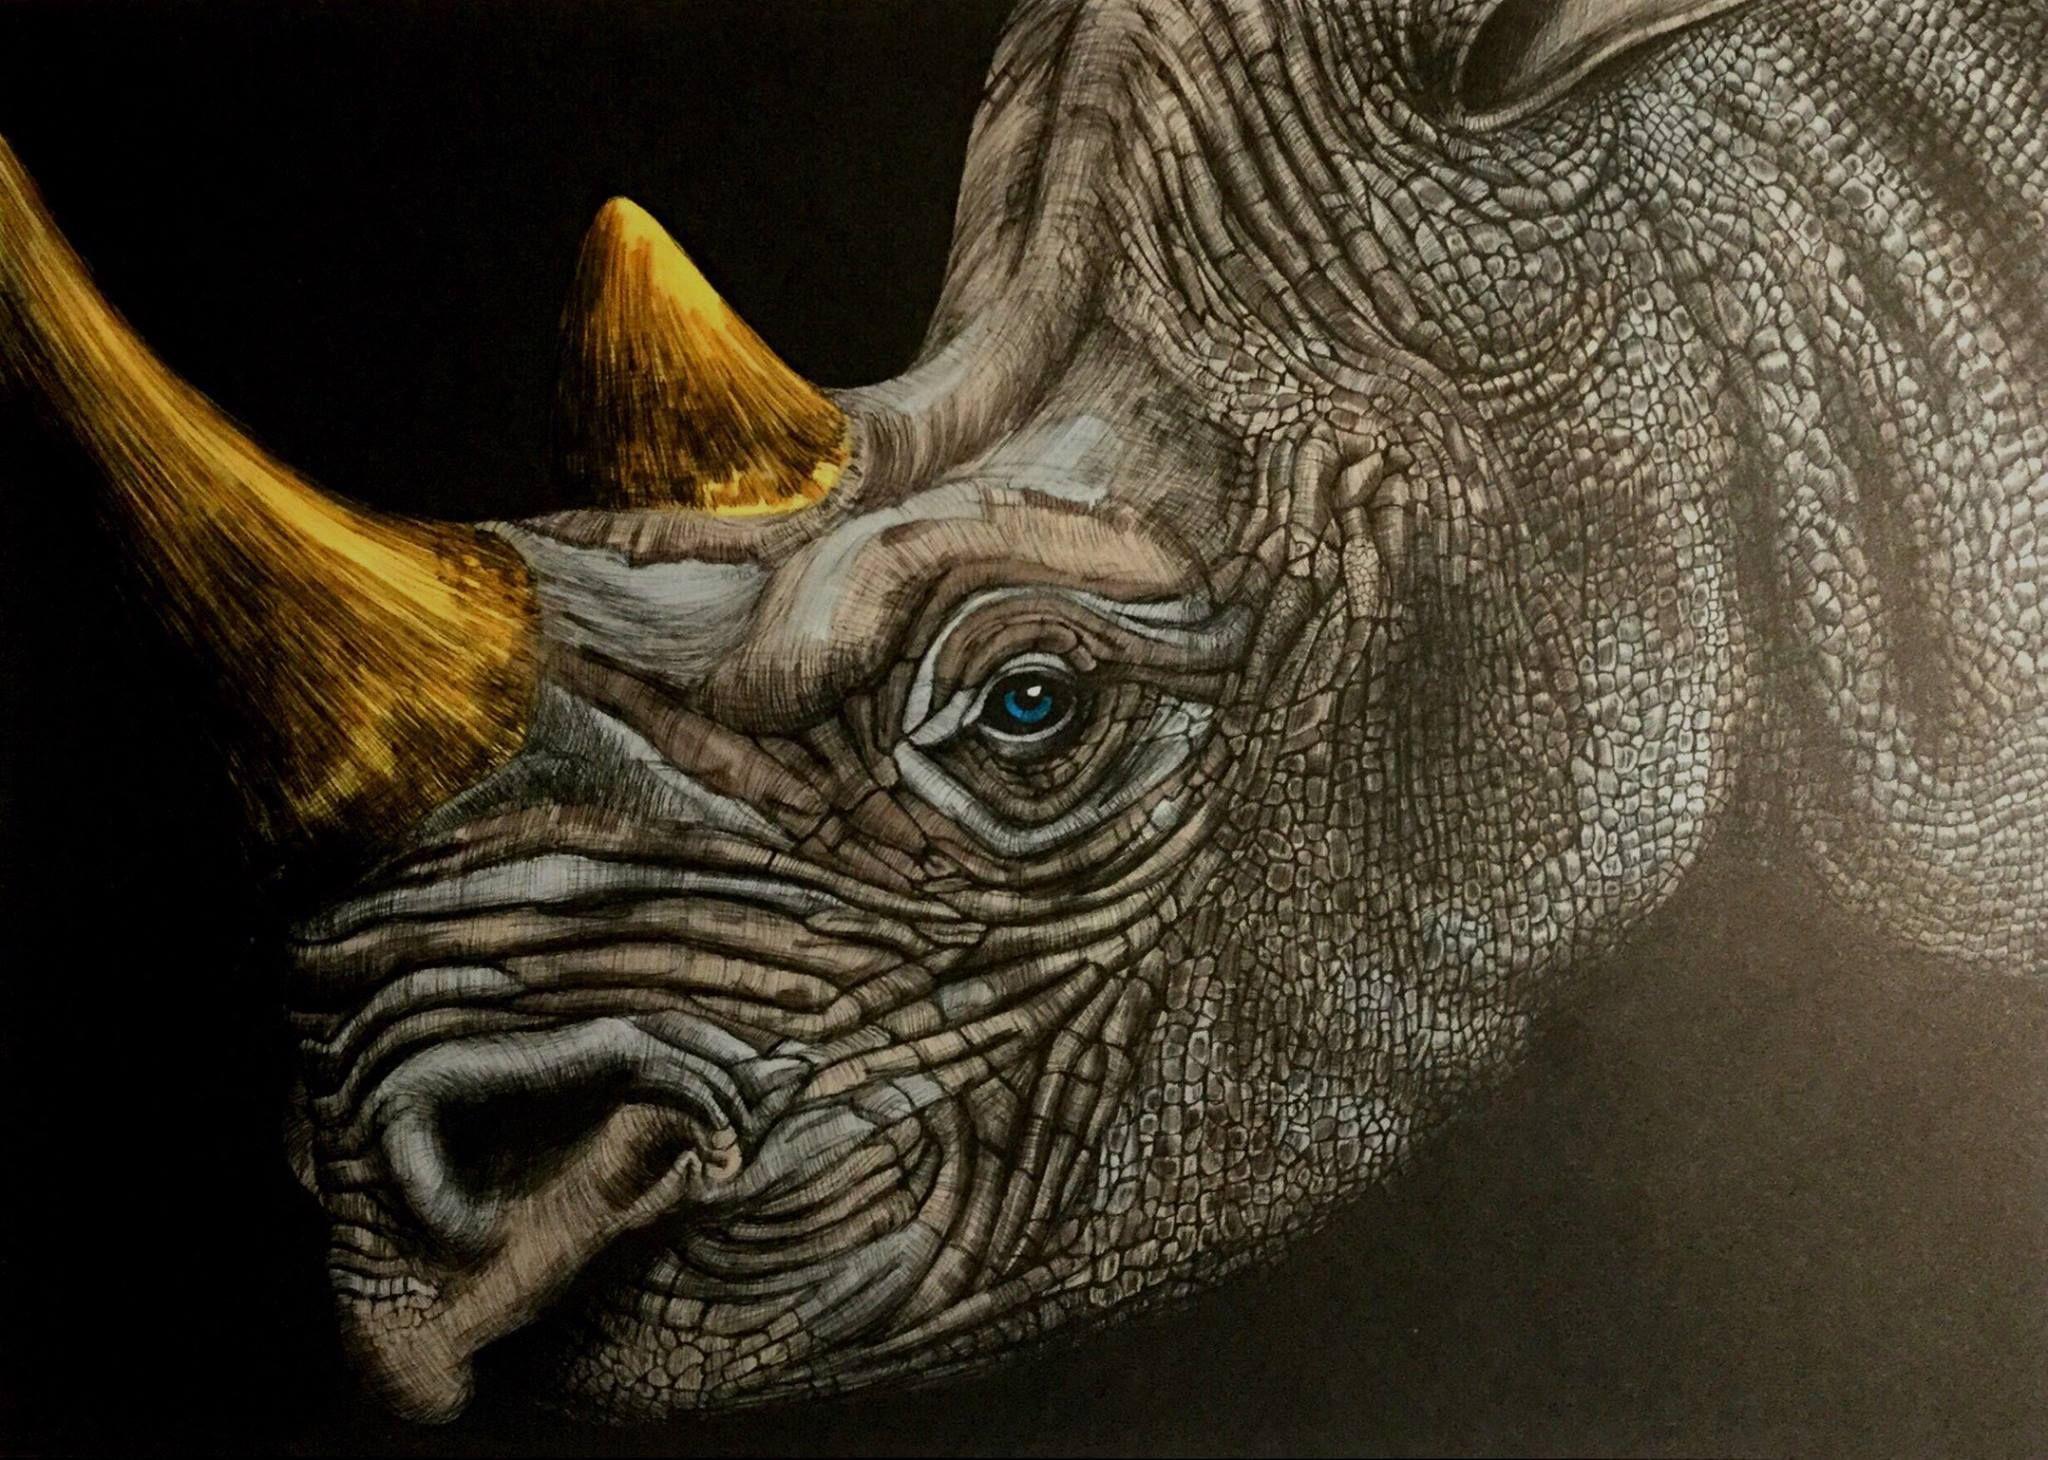 Rhinoceros By Benji Jager Dieren Inkt Kleurplaten